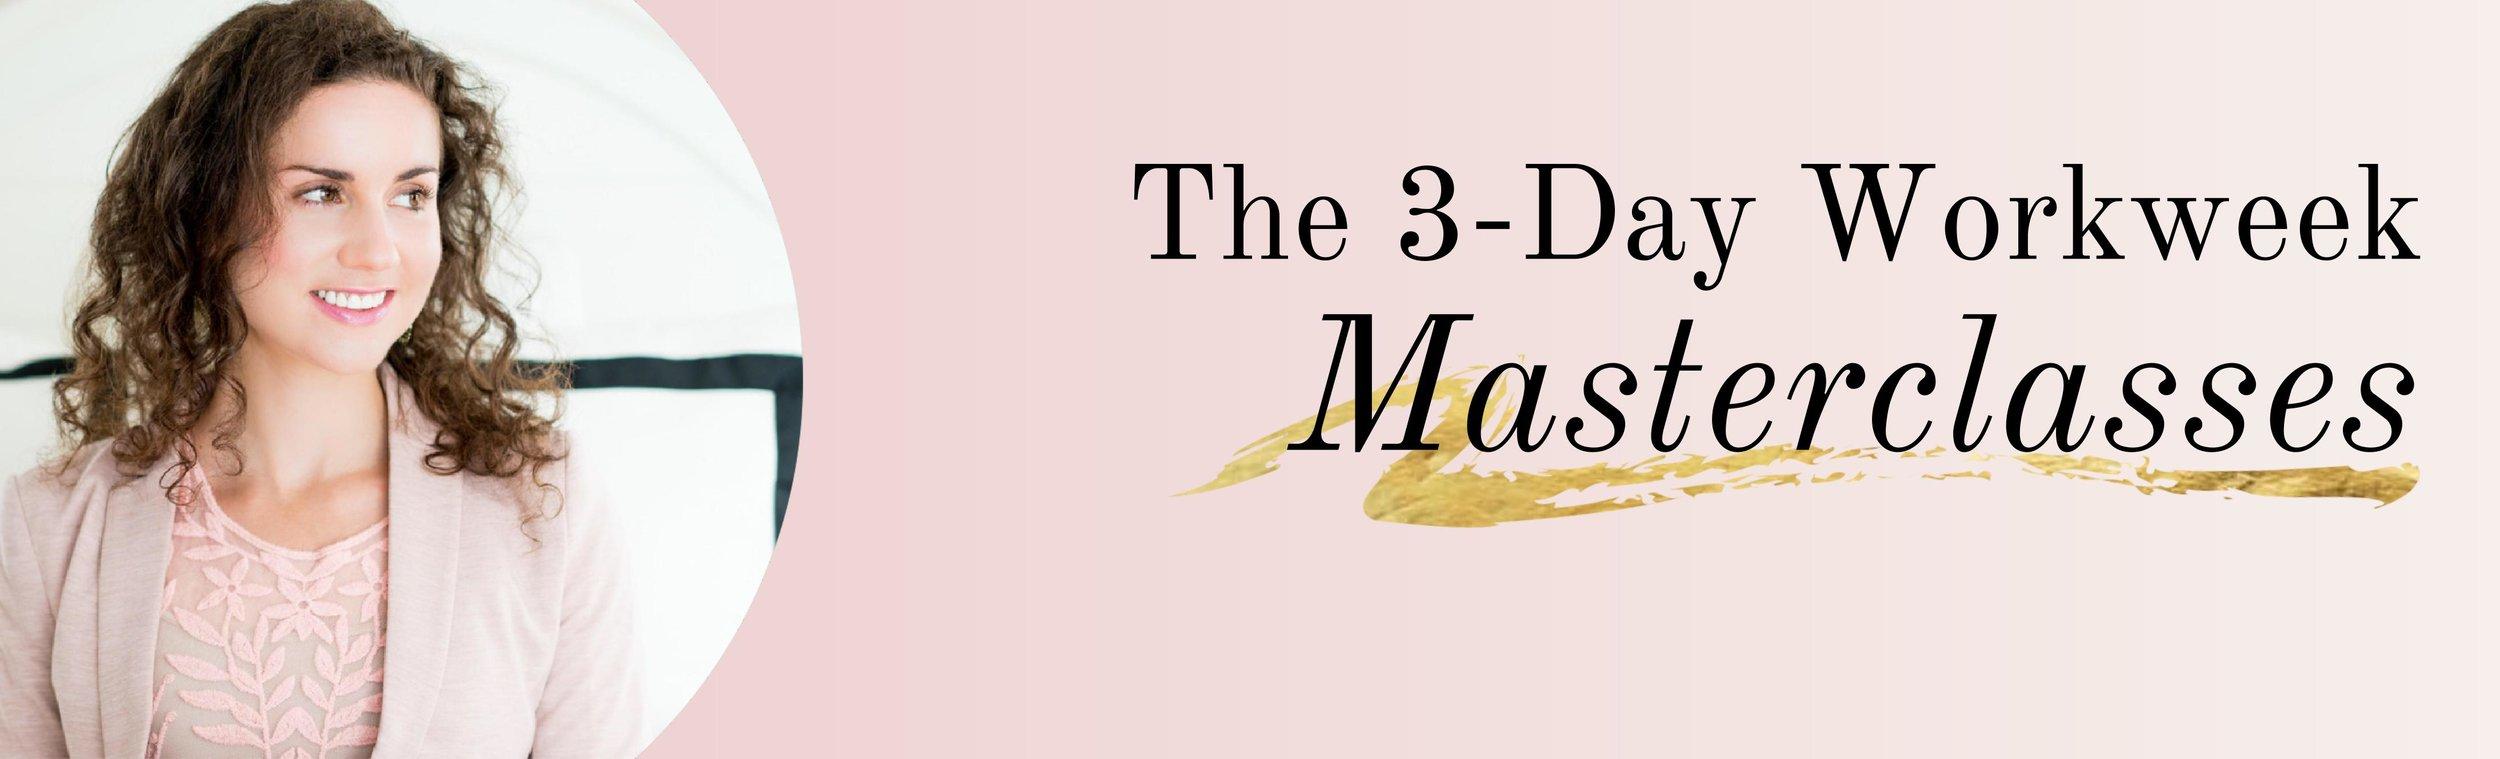 3DWW Masterclasses - Banner.jpg